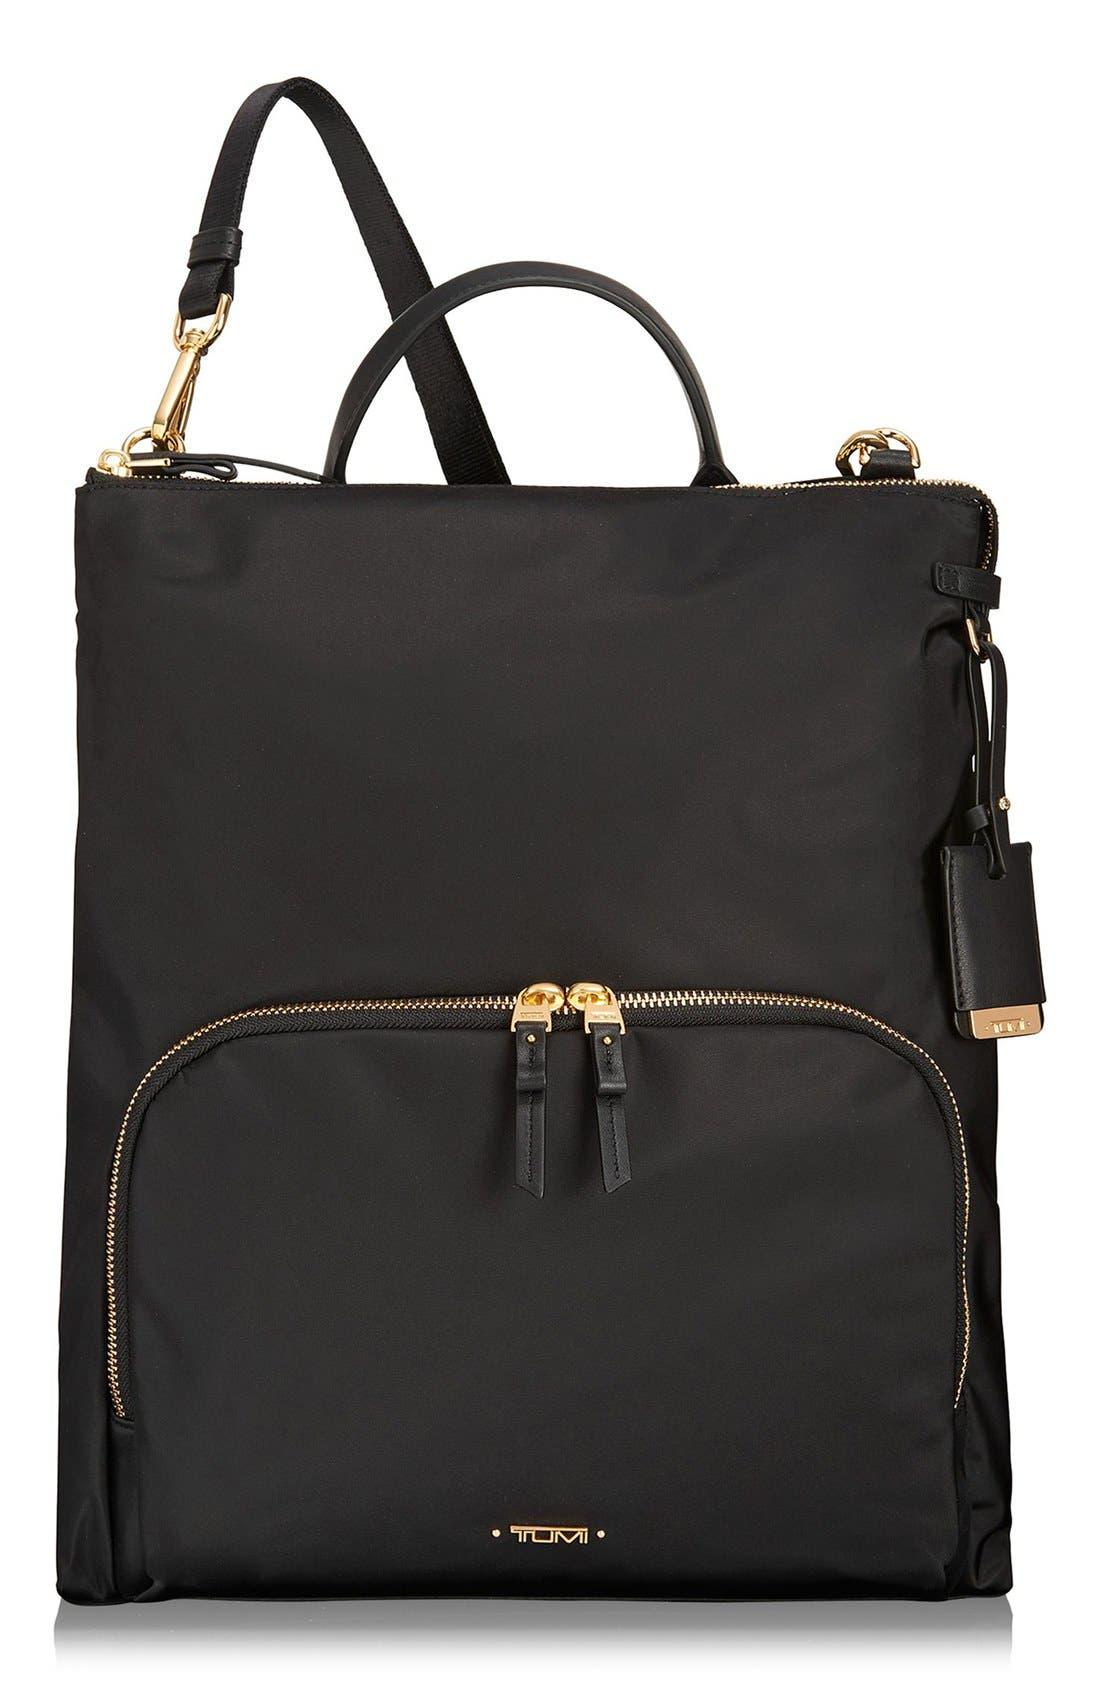 Main Image - Tumi Voyageur - Jackie Convertible Crossbody Bag